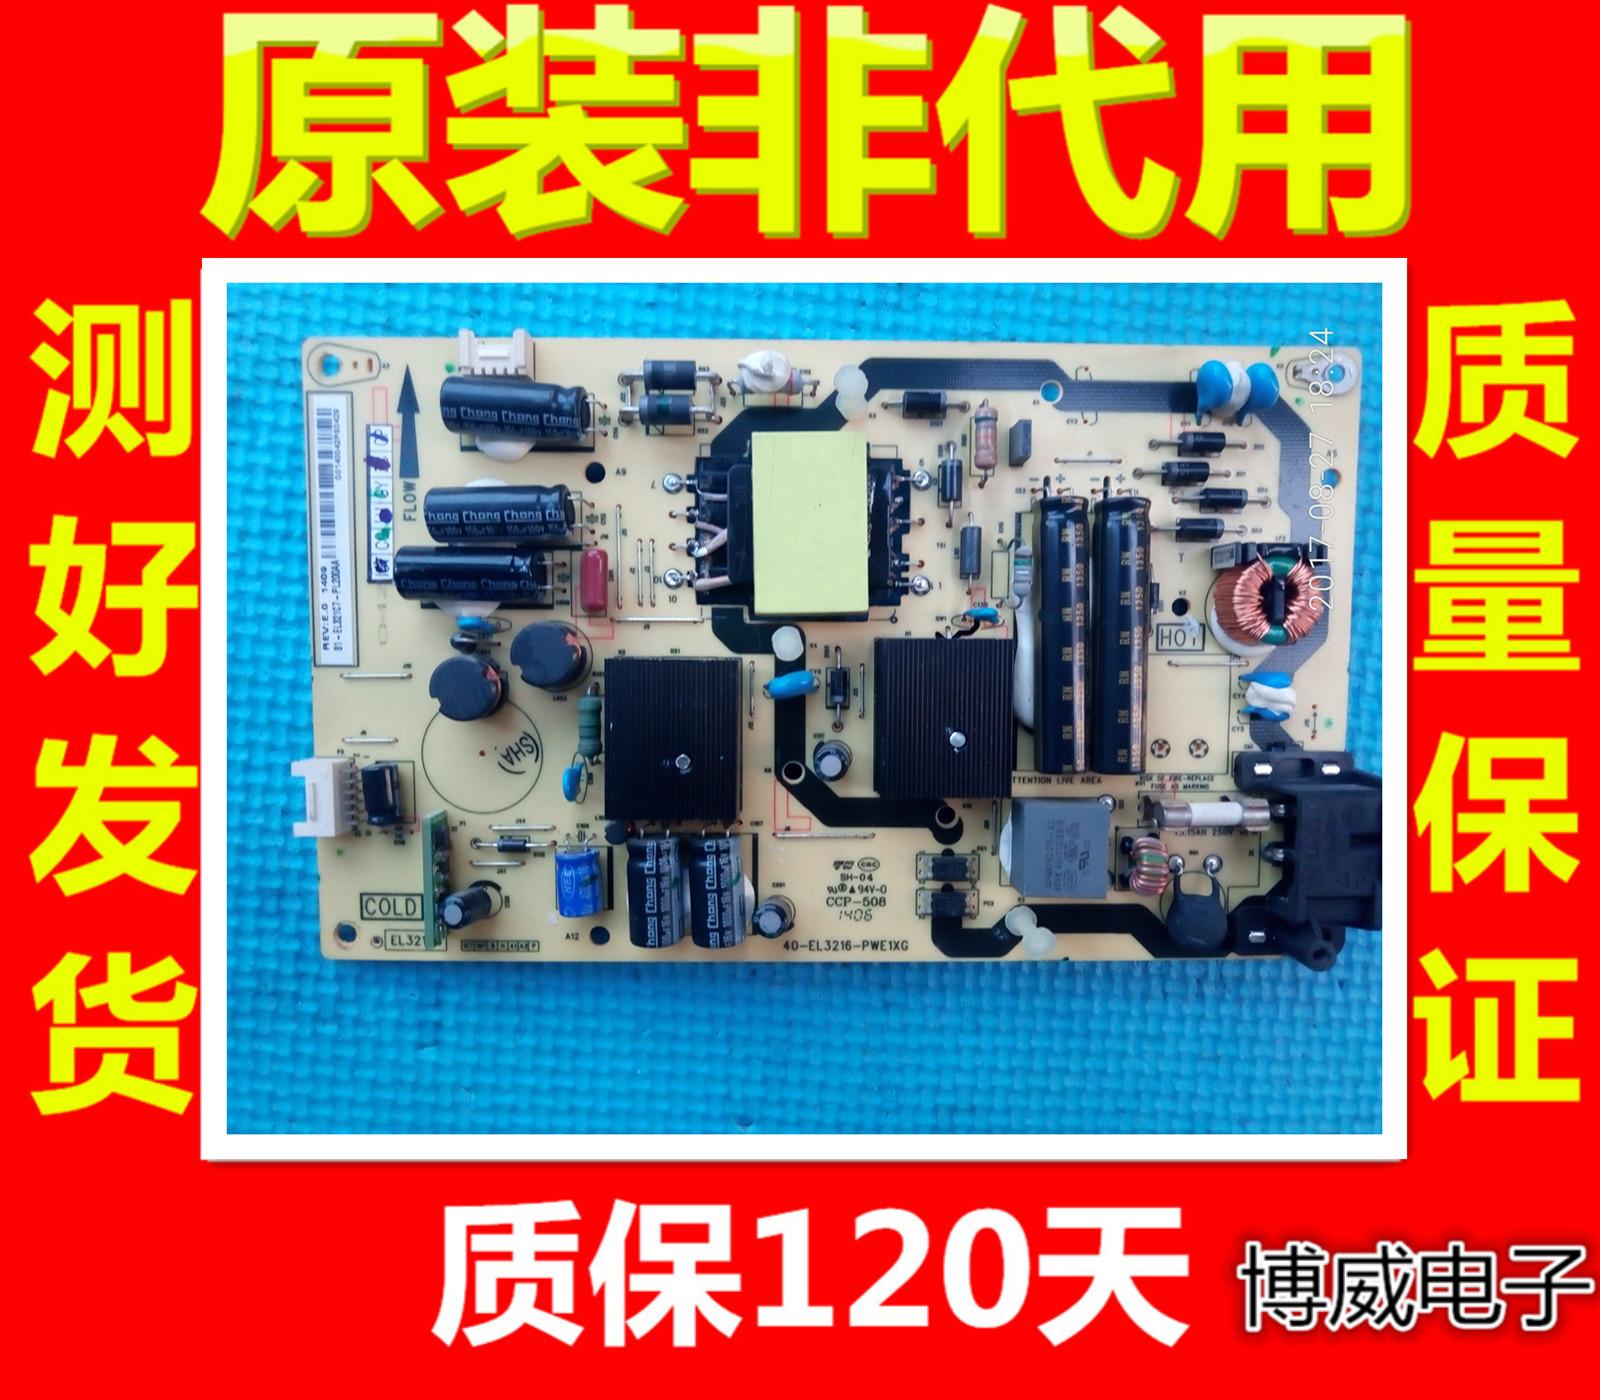 TCLL32F1600E32 - Zoll - HD - LCD fernseher Power Board my811 hintergrundbeleuchtung stromversorgung - Aufsichtsrat